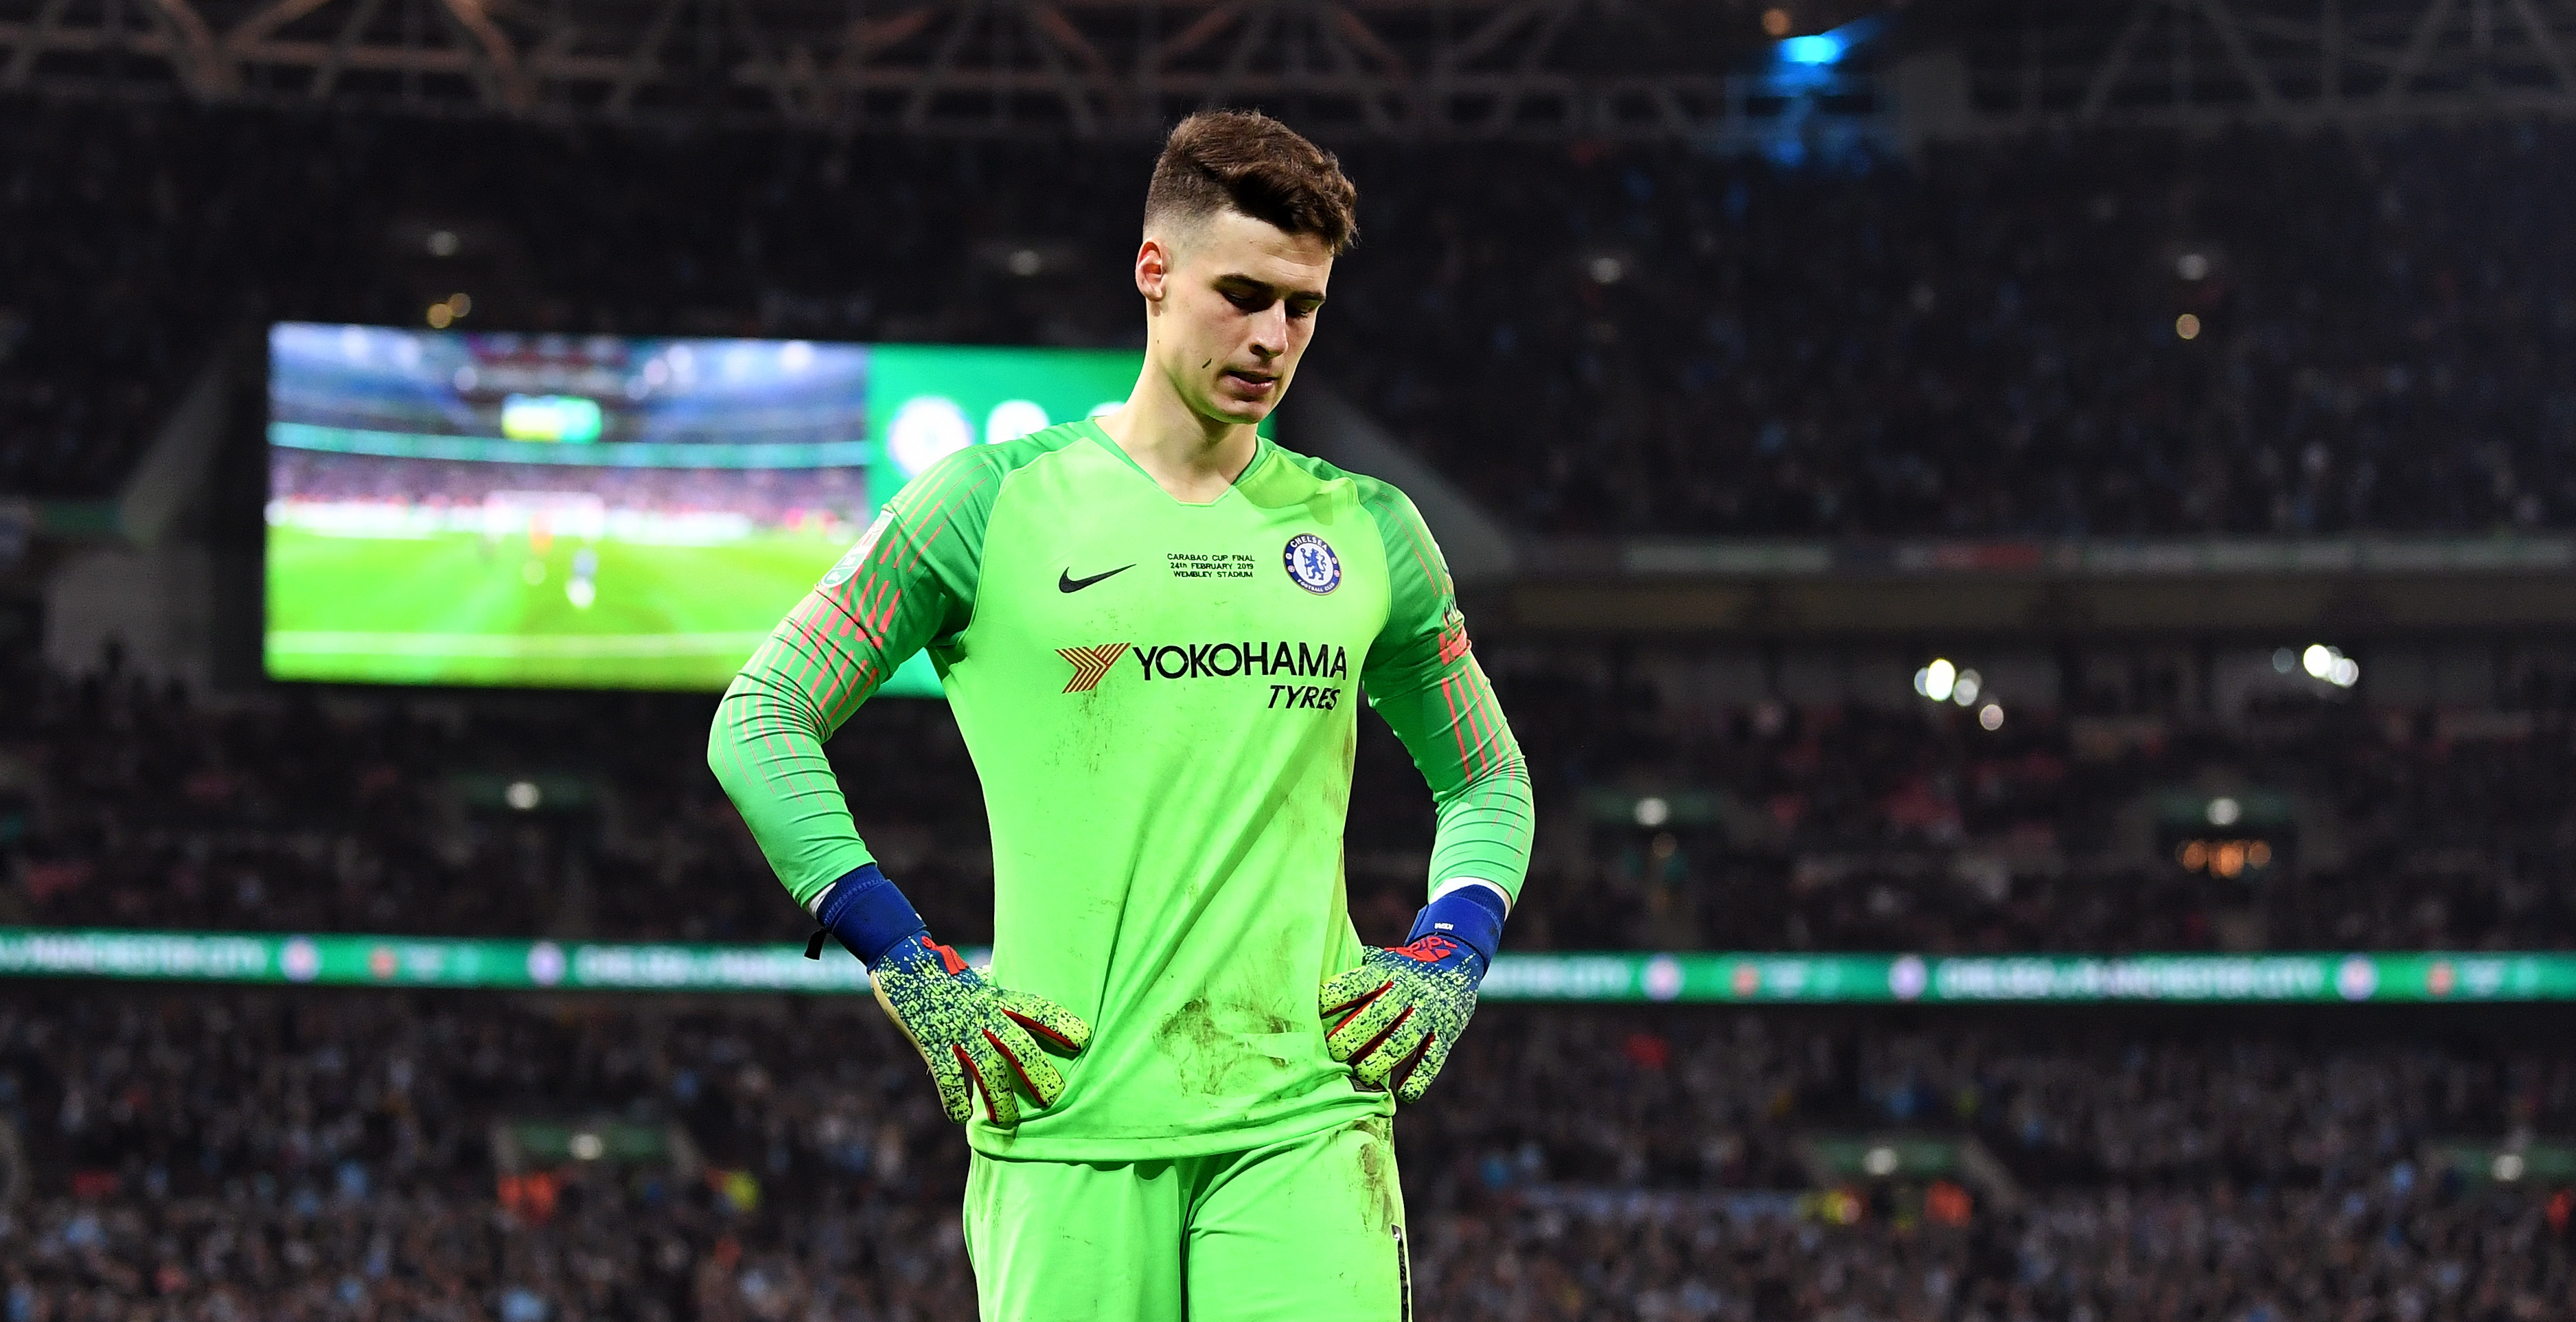 Kepas verweigerte Auswechslung: Mourinho übt Kritik | Goal.com